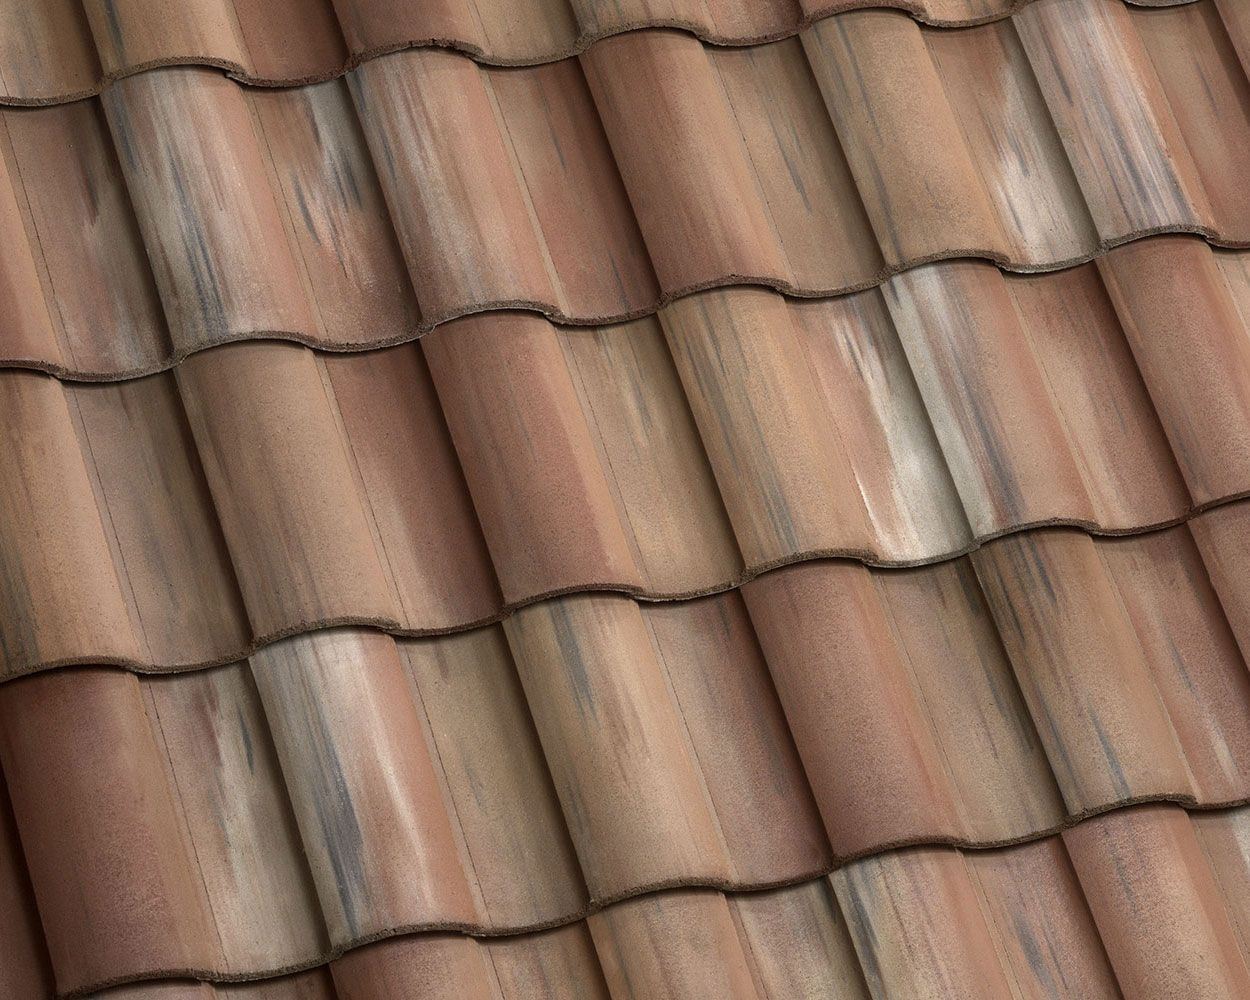 Roof Tile Eagle Capistrano 3629 Floridian Blend Roof Tiles Concrete Roof Tiles Florida Style